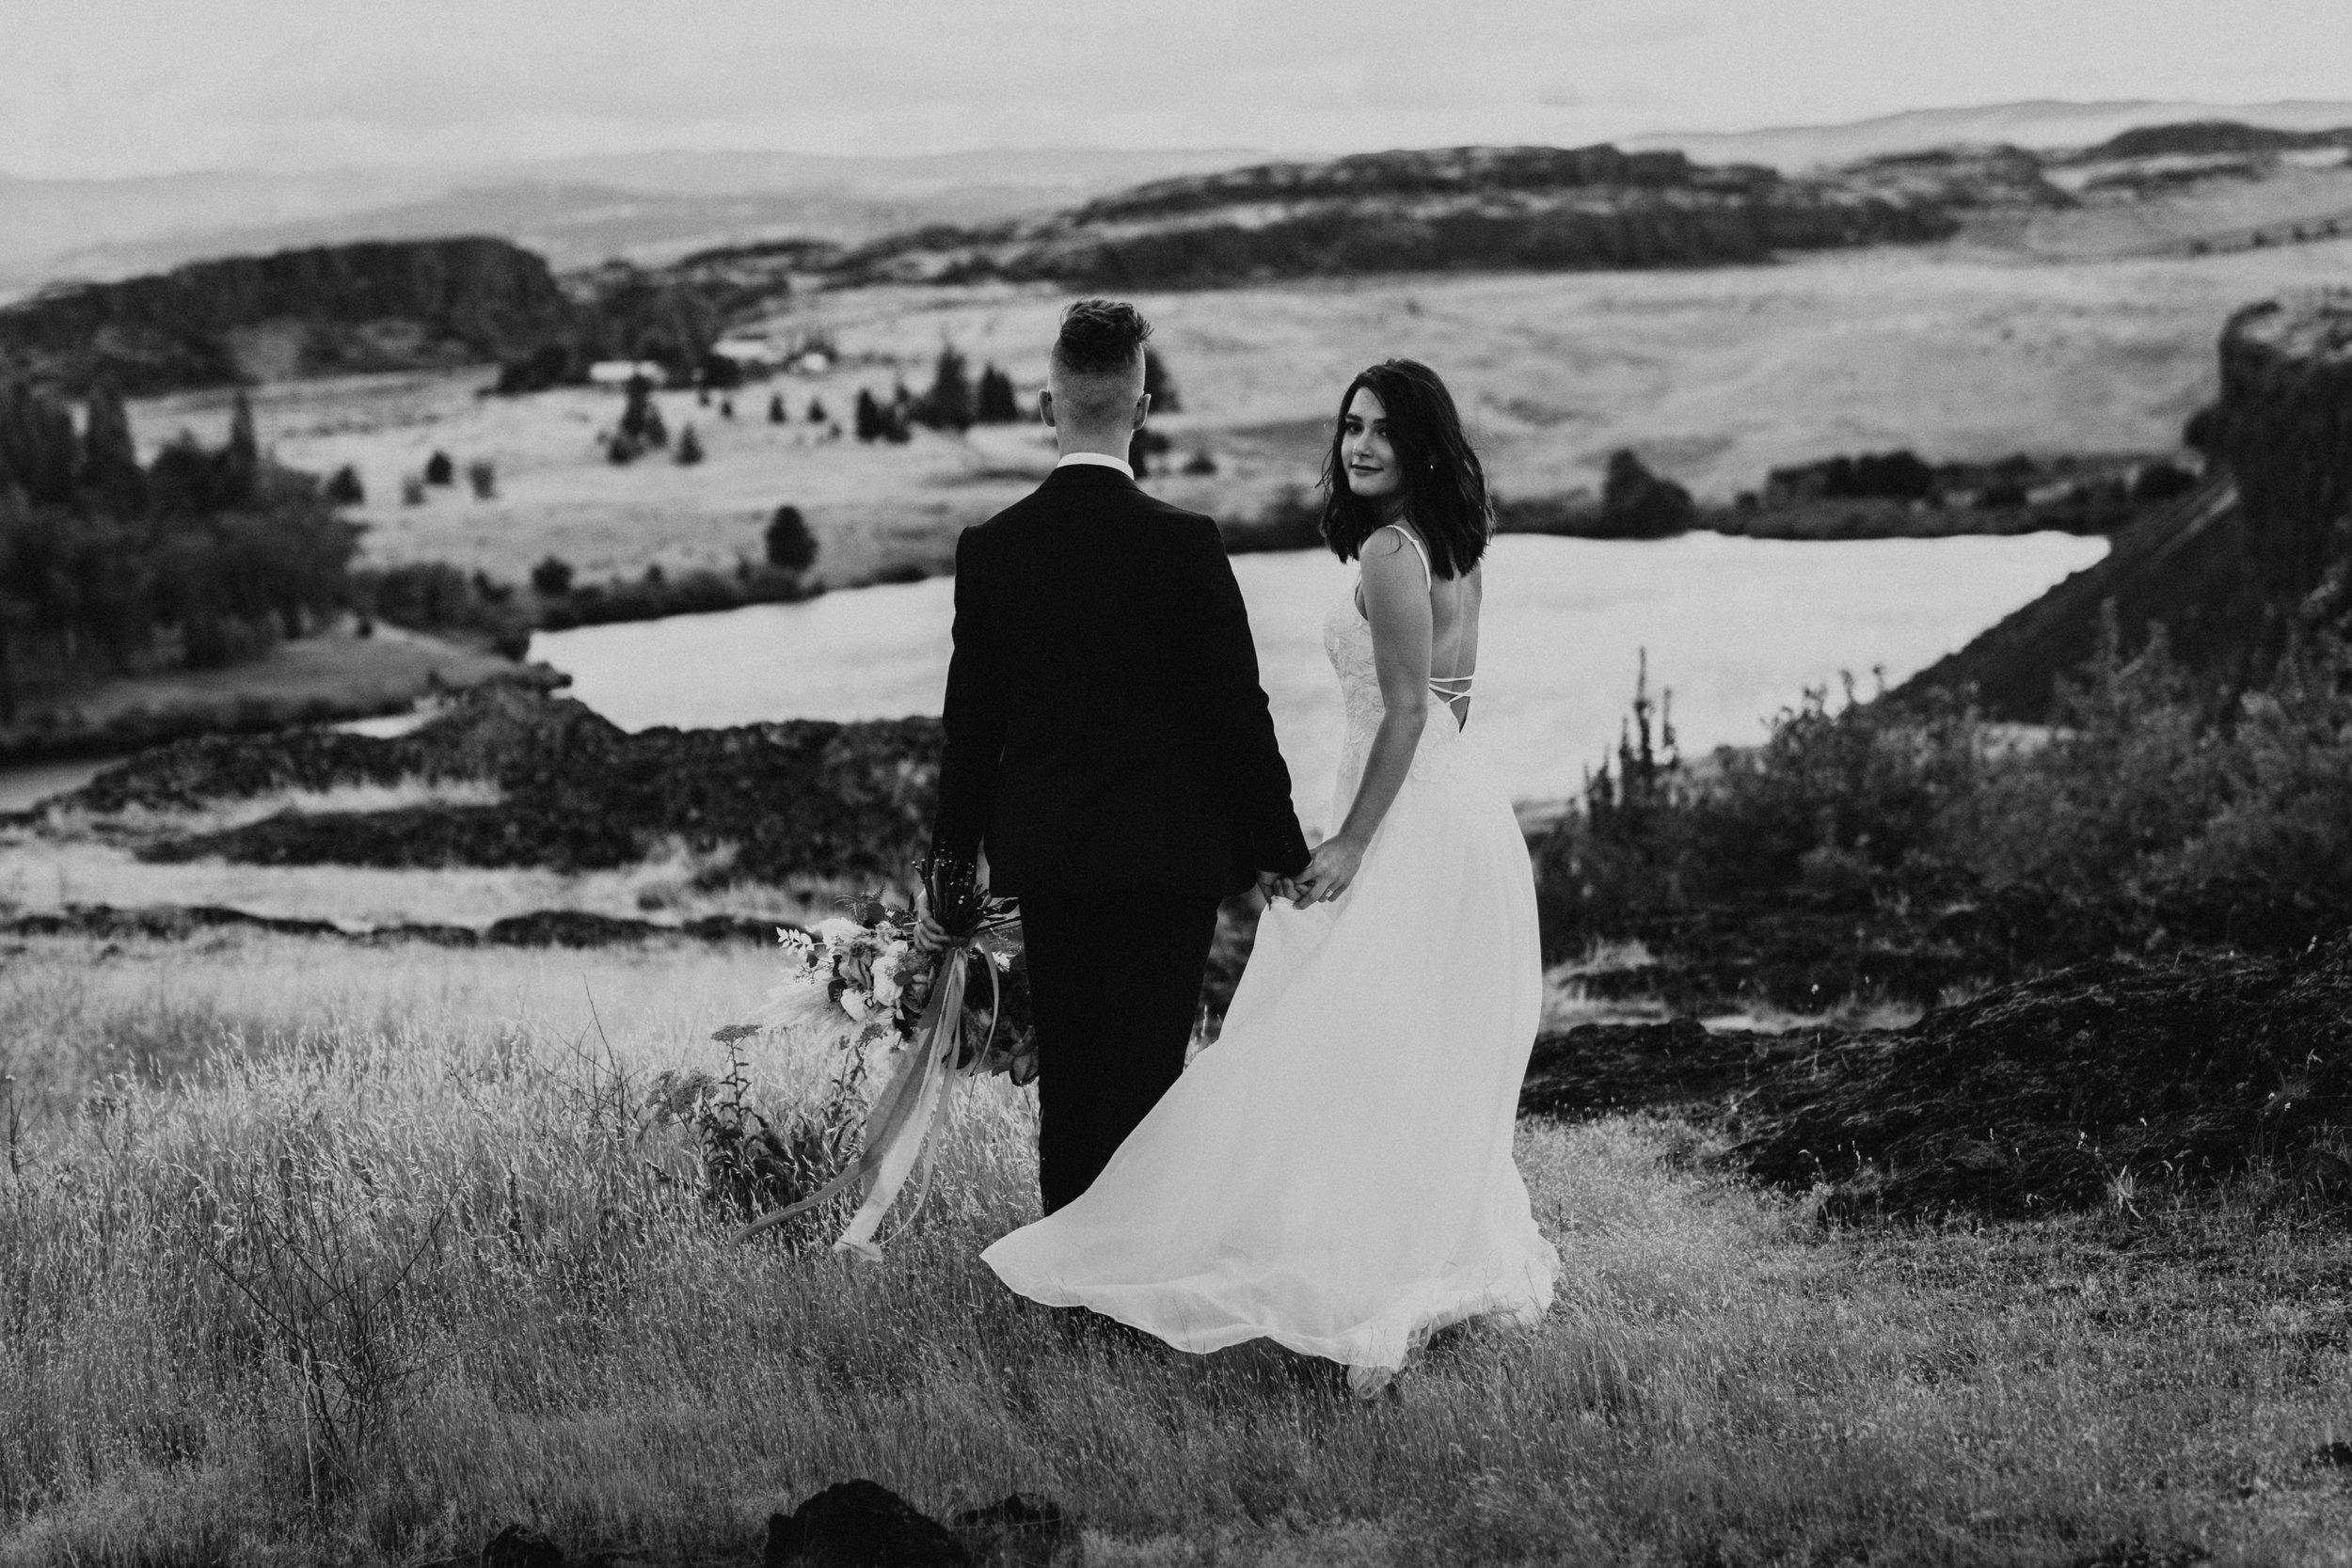 columbia-river-gorge-wedding-elopement-inspiration-34.jpg